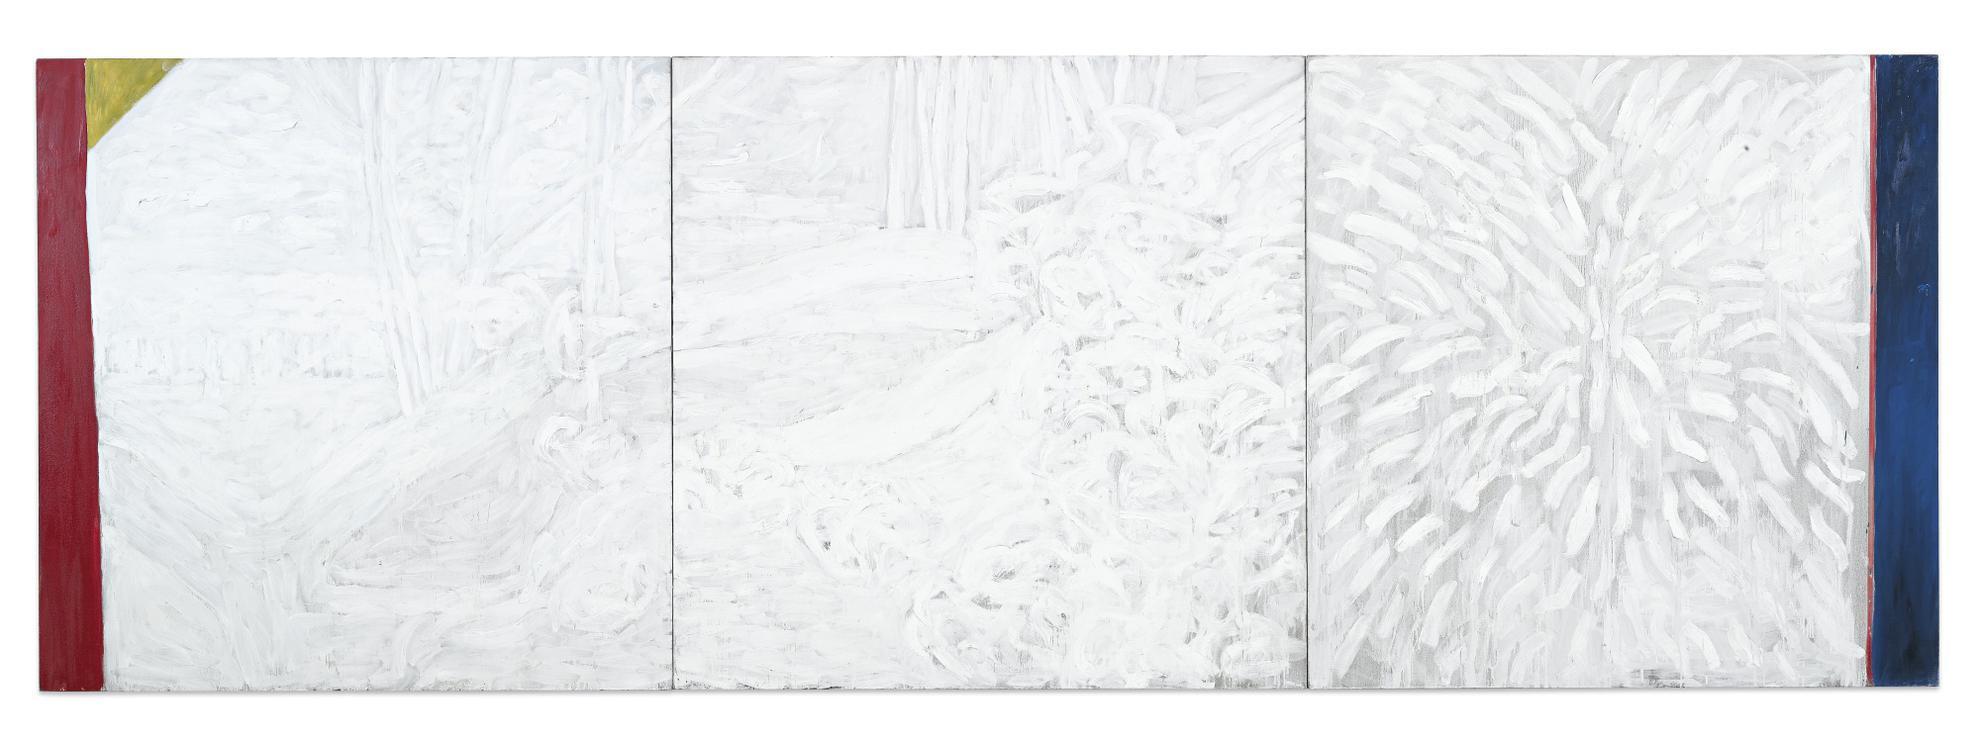 Pat Steir-Zen Tree [Triptych]-1983